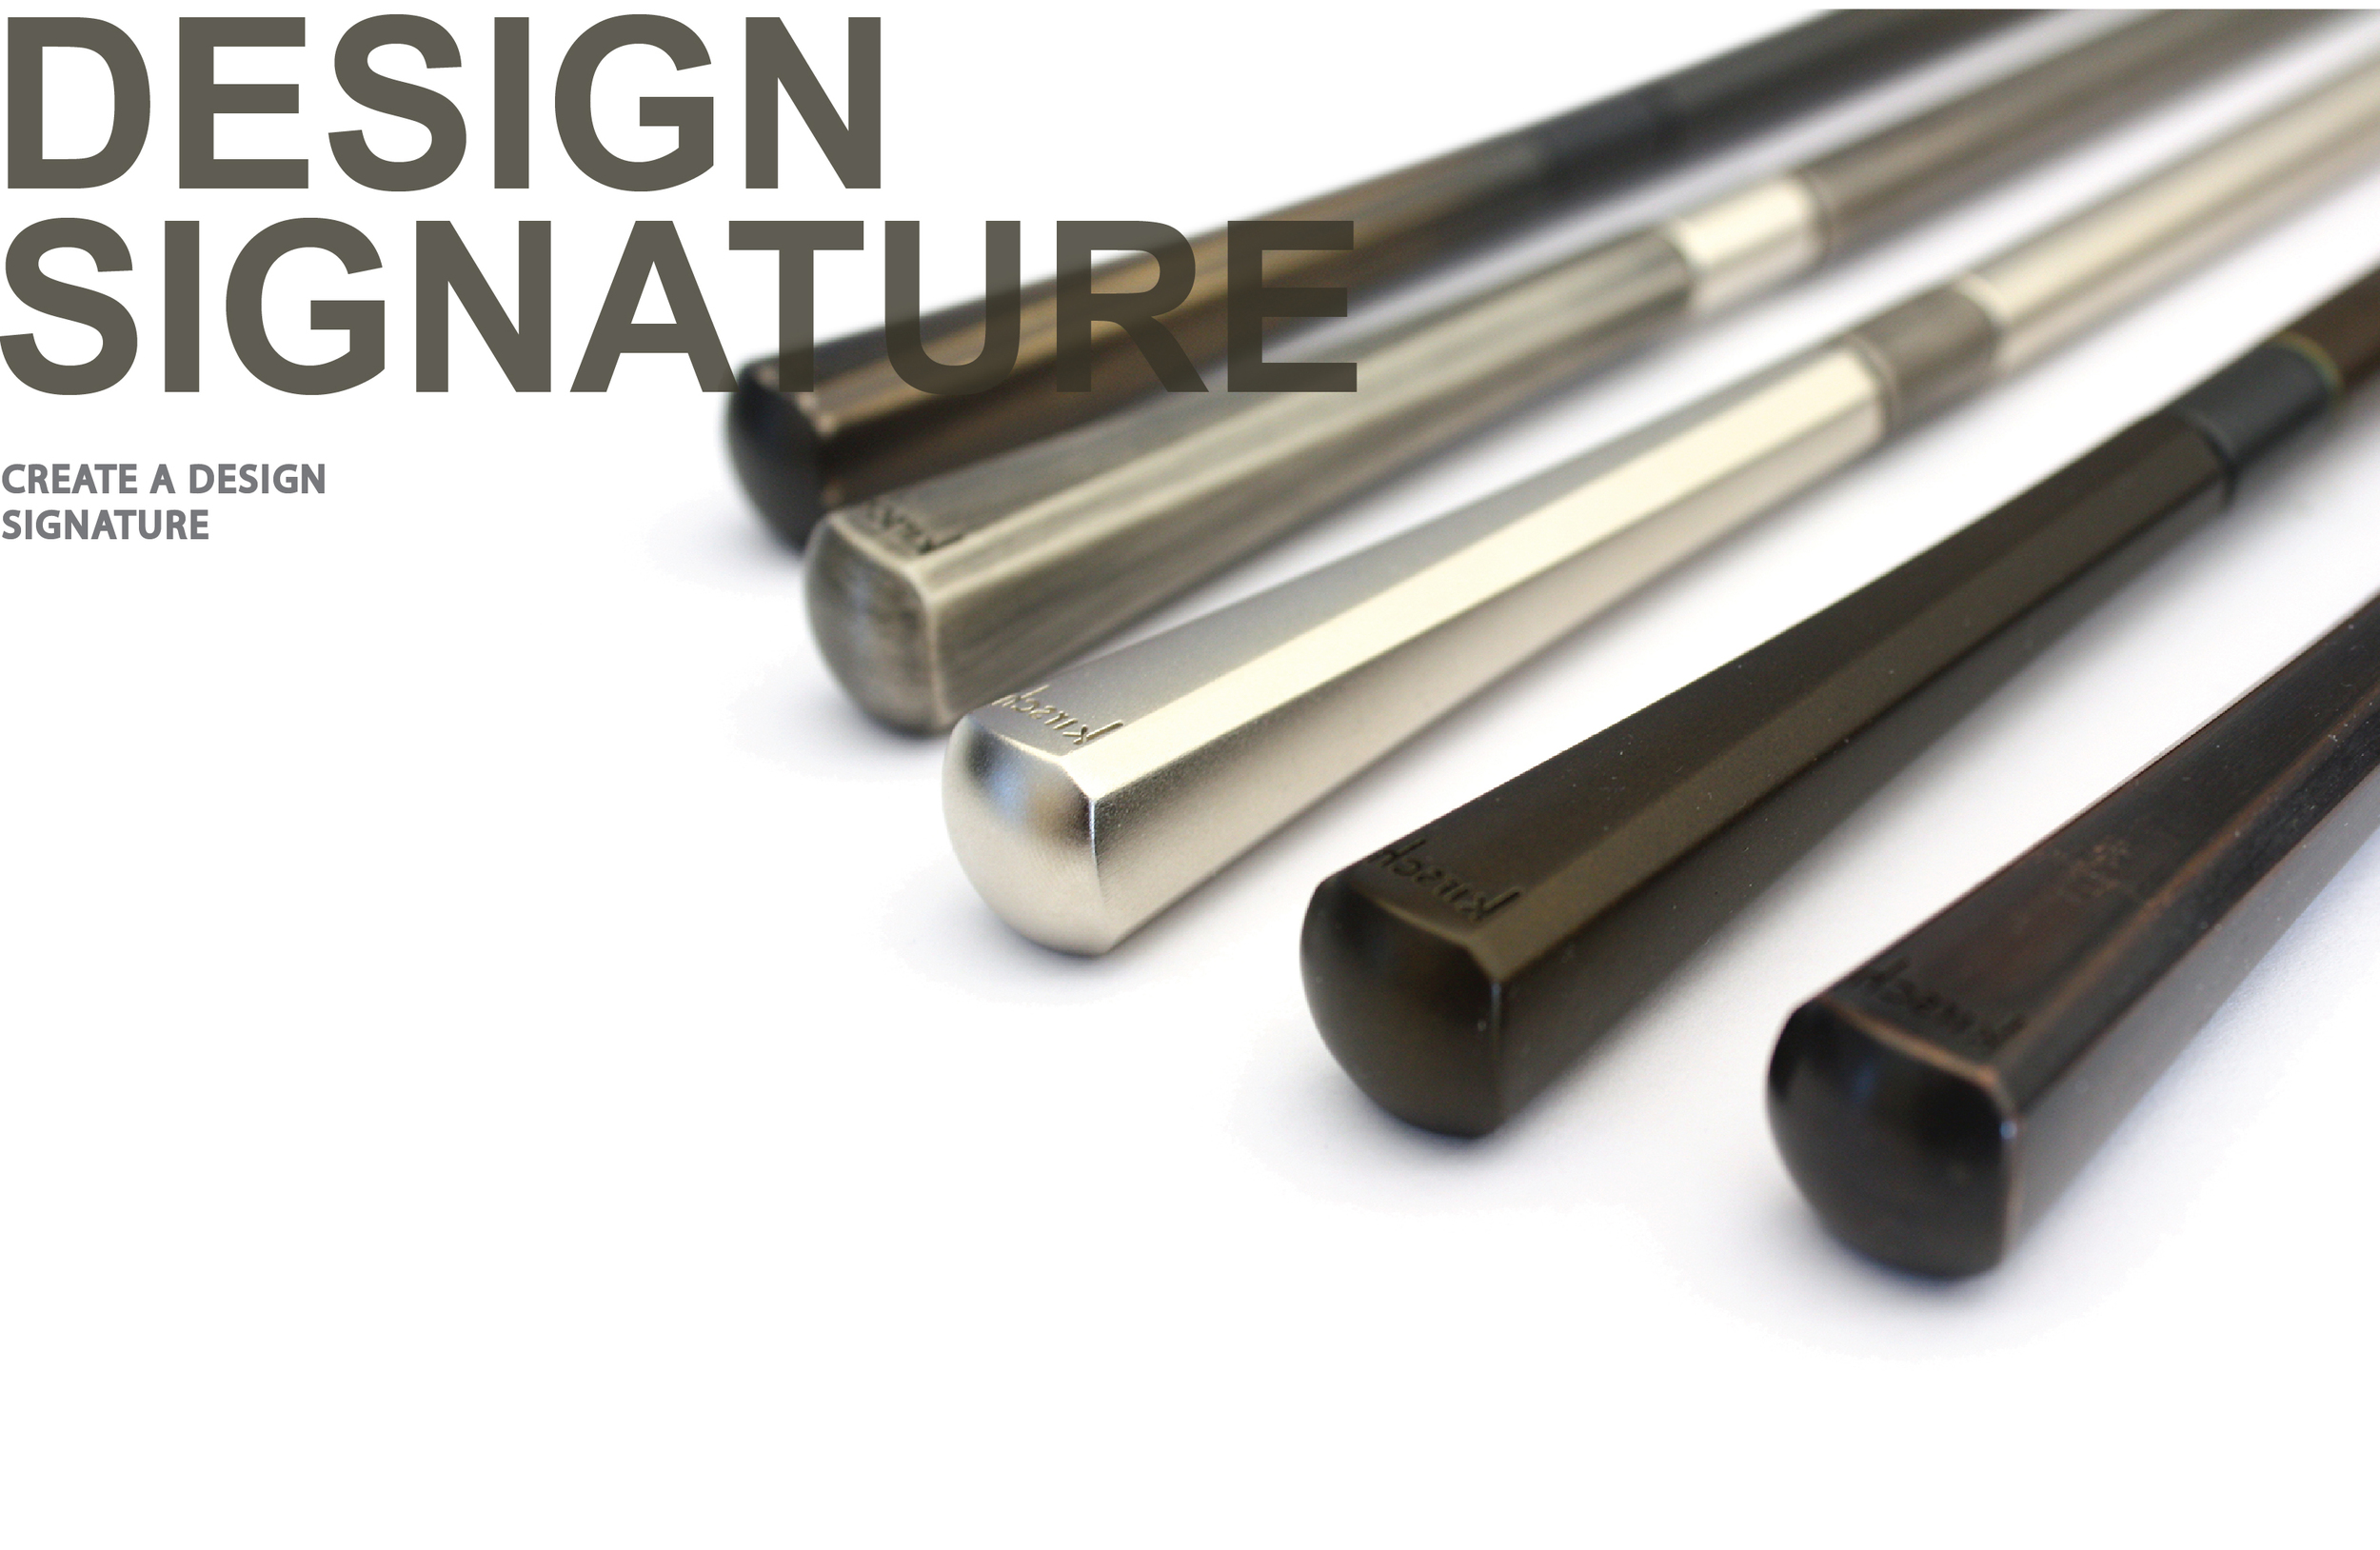 Design Signature Touchpoints